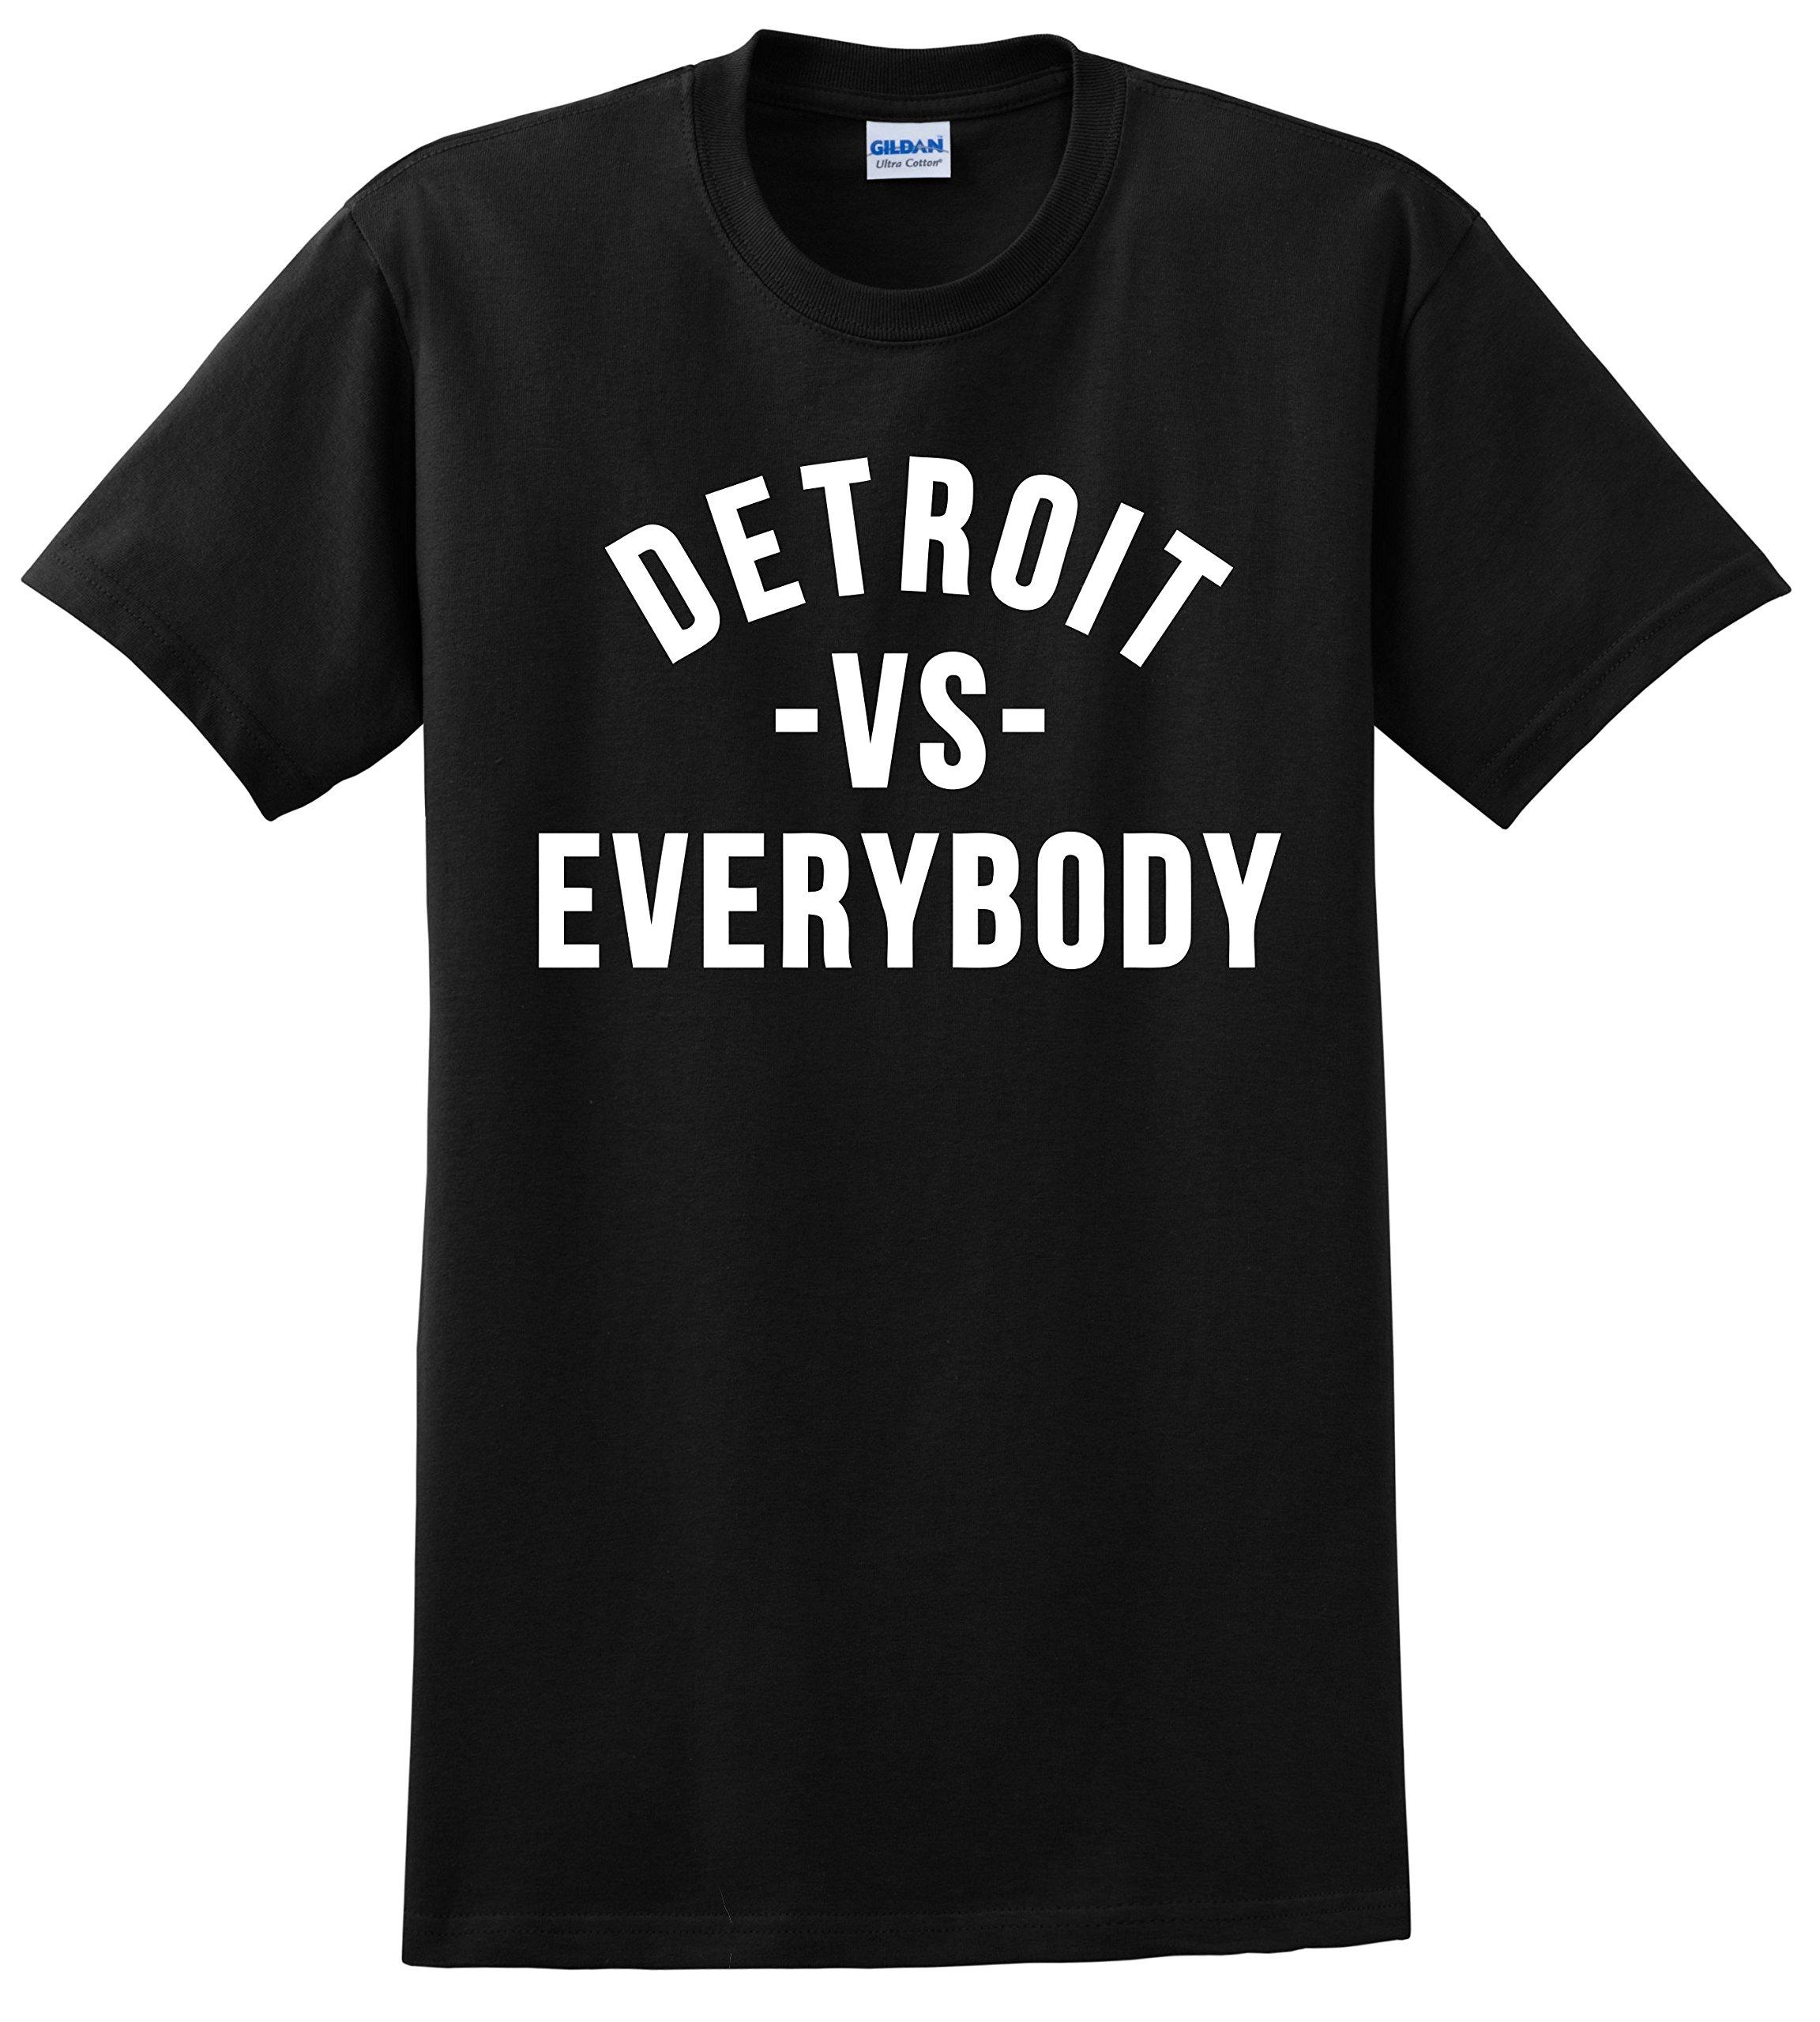 Tshirts Lands Detroit VS Everybody T Shirt No Love Eminem Big Sean Unisex Tee Shirts